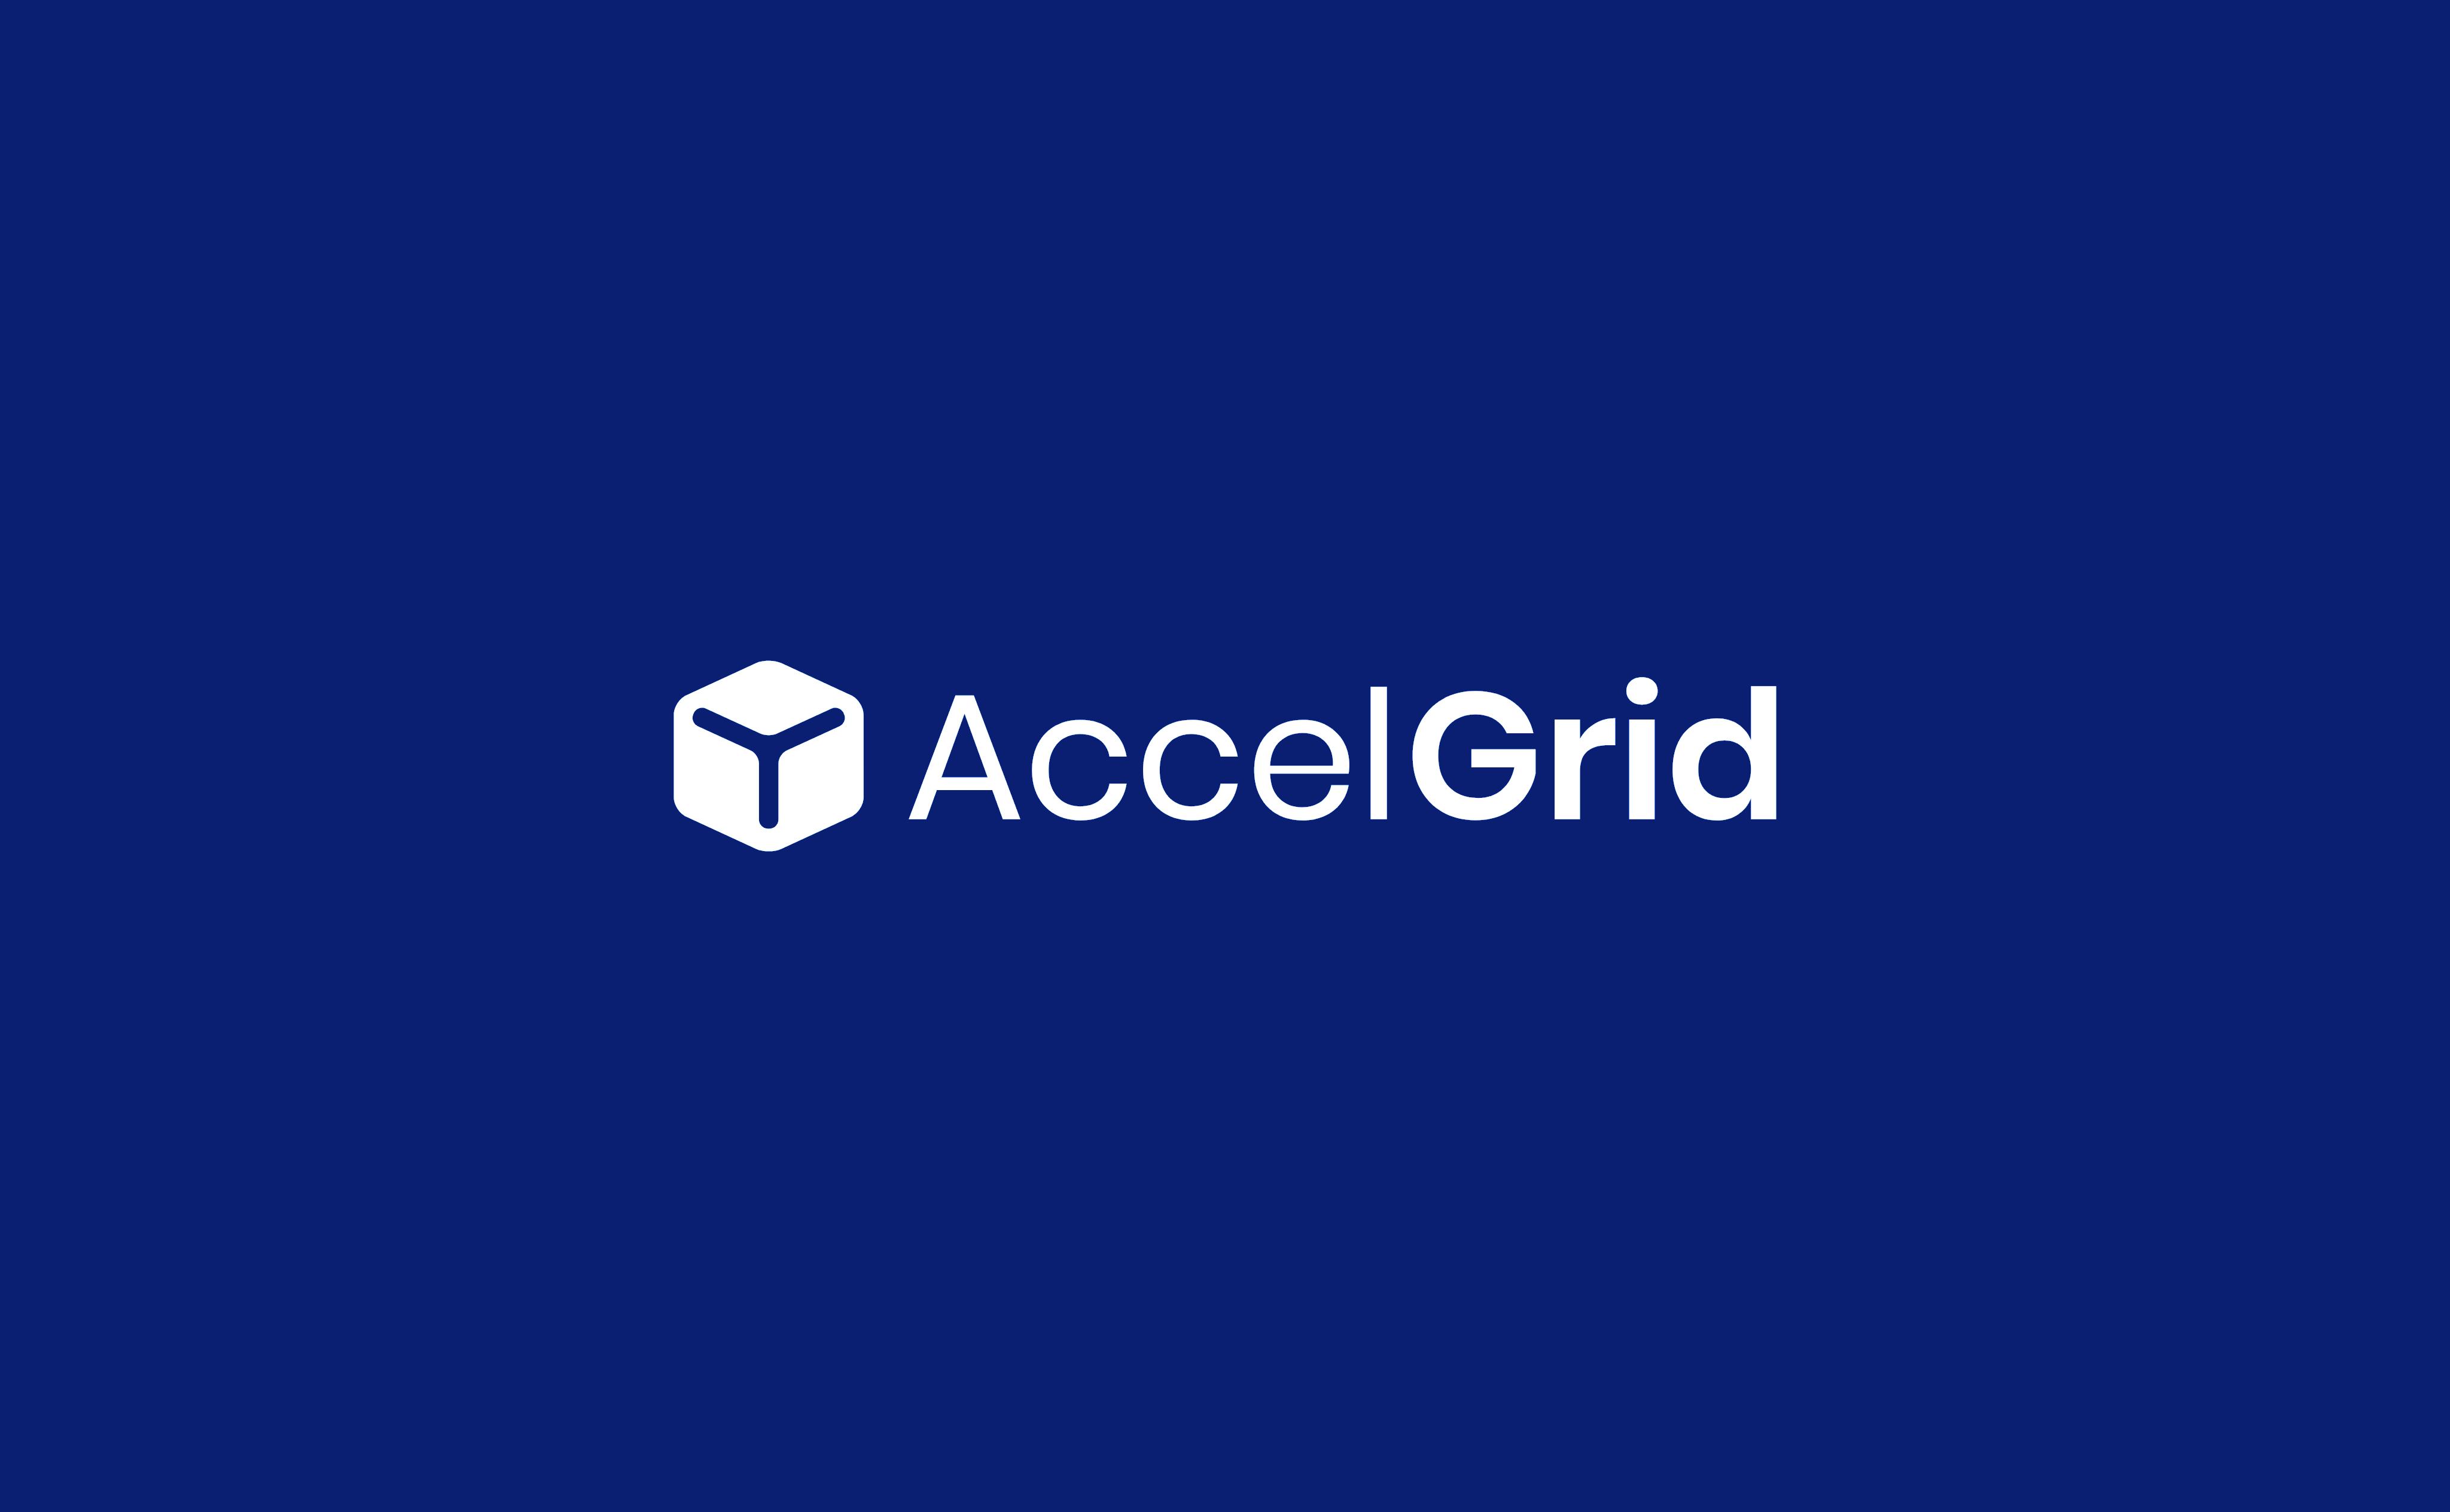 AccelGrid